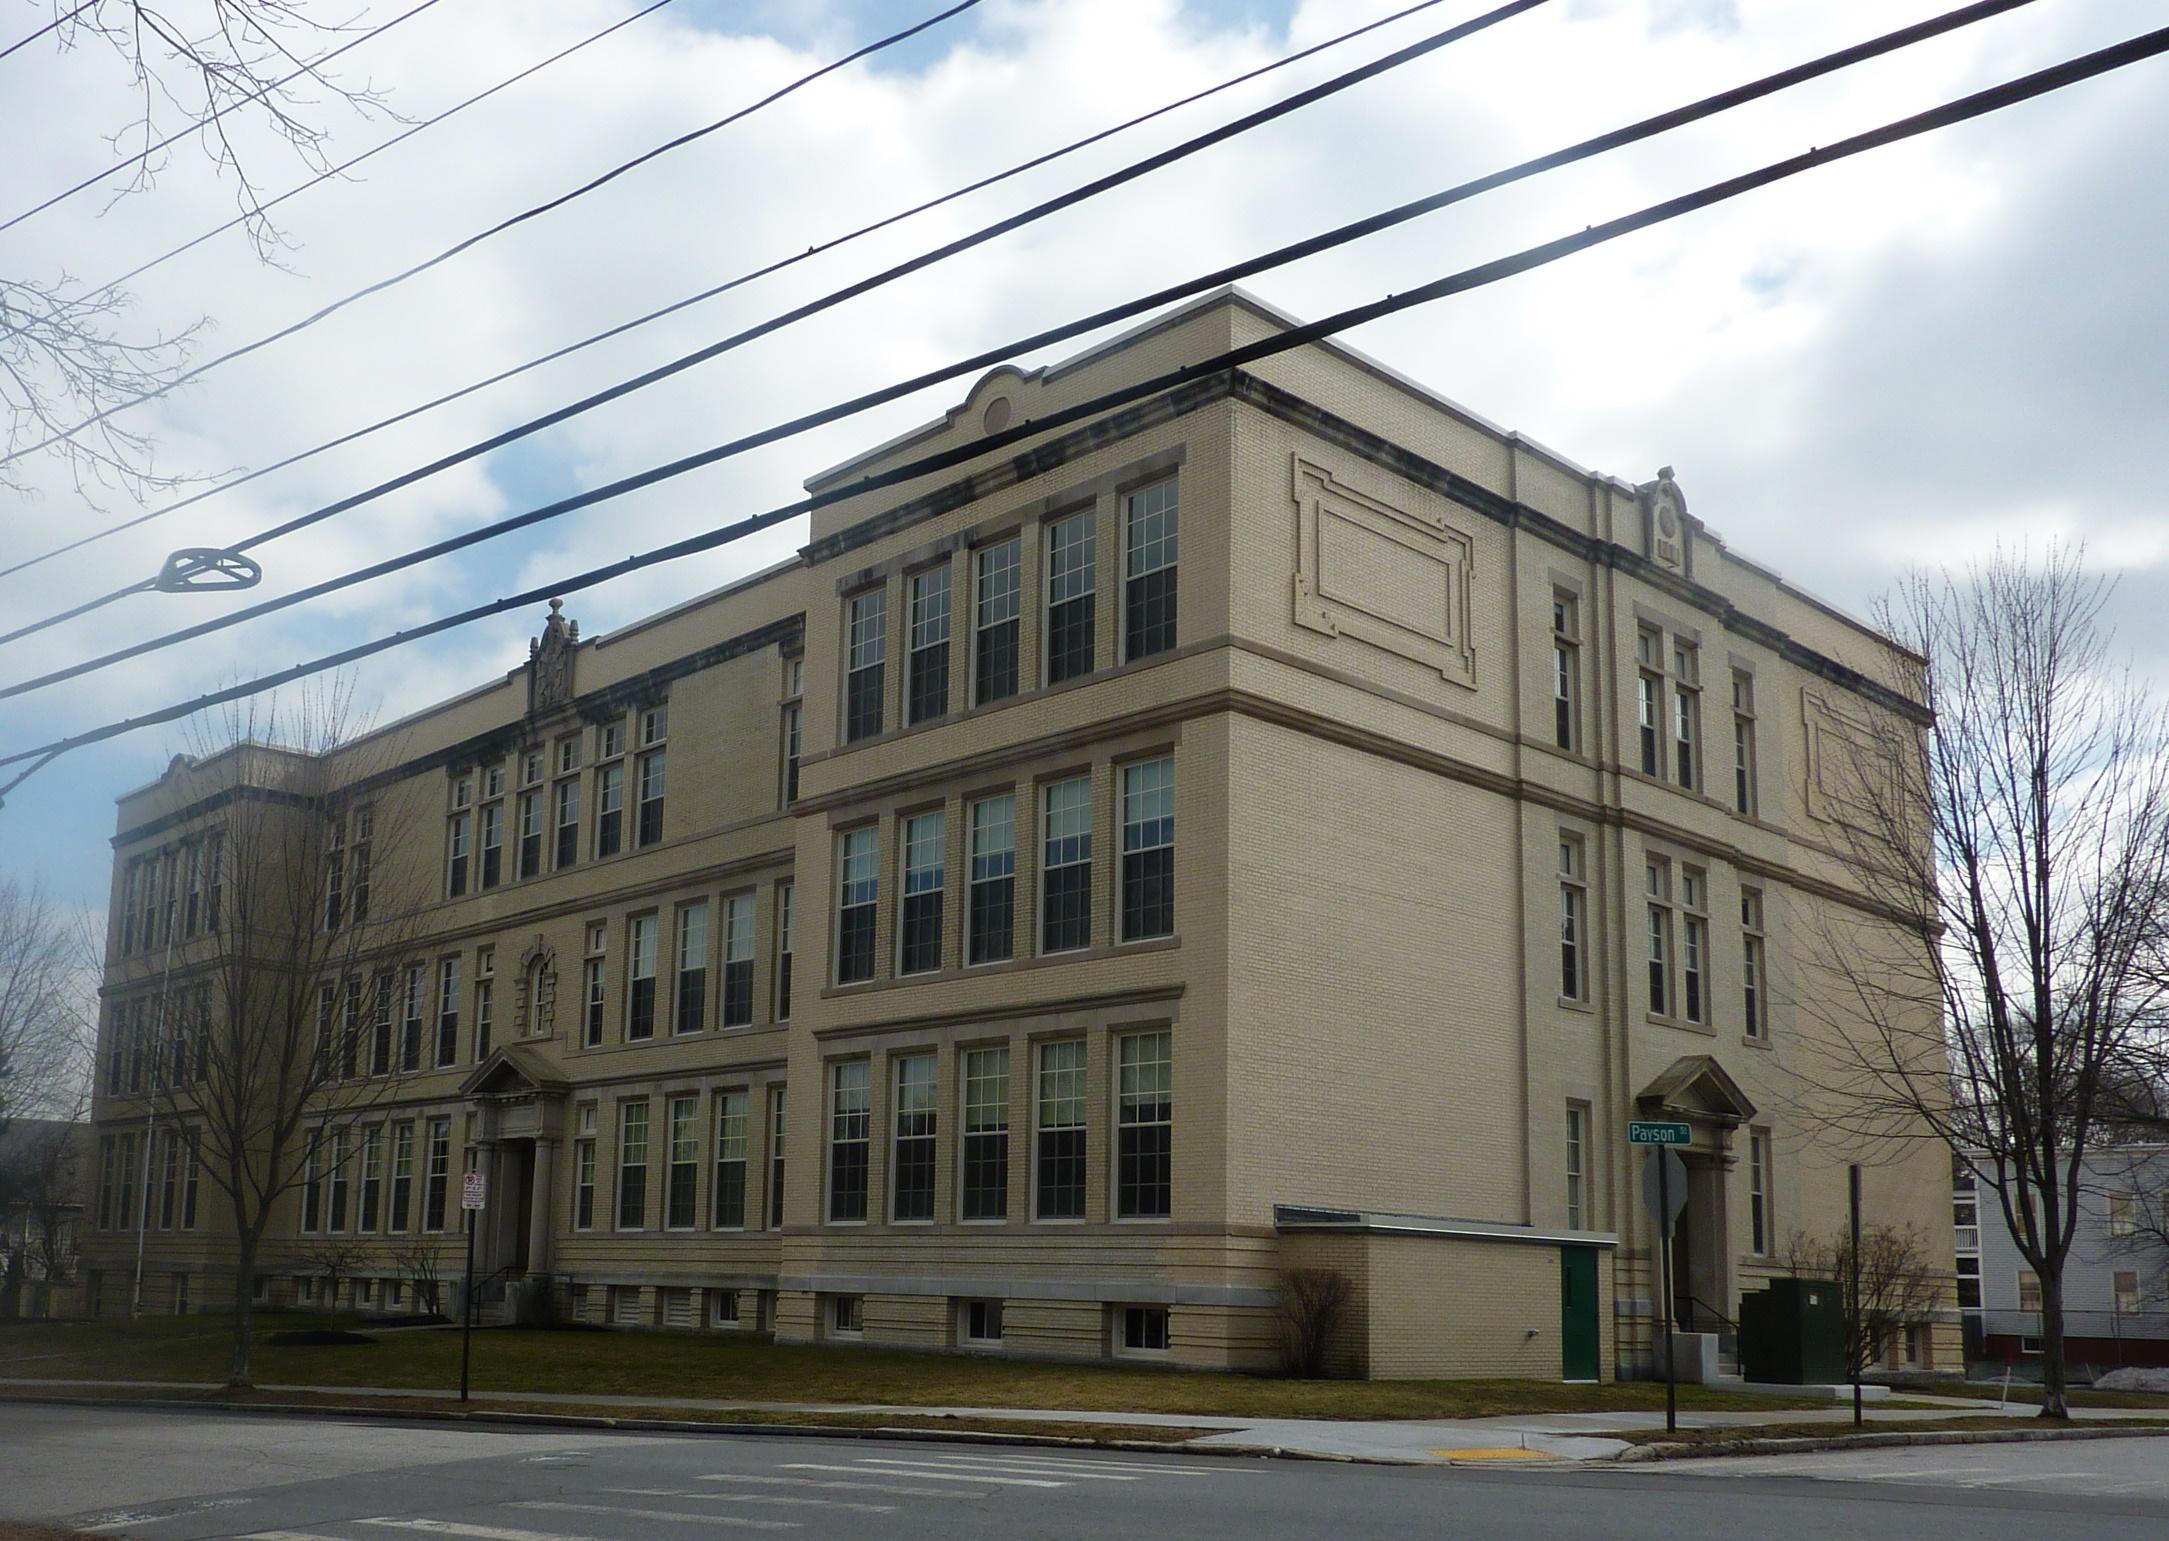 Nathan Clifford School